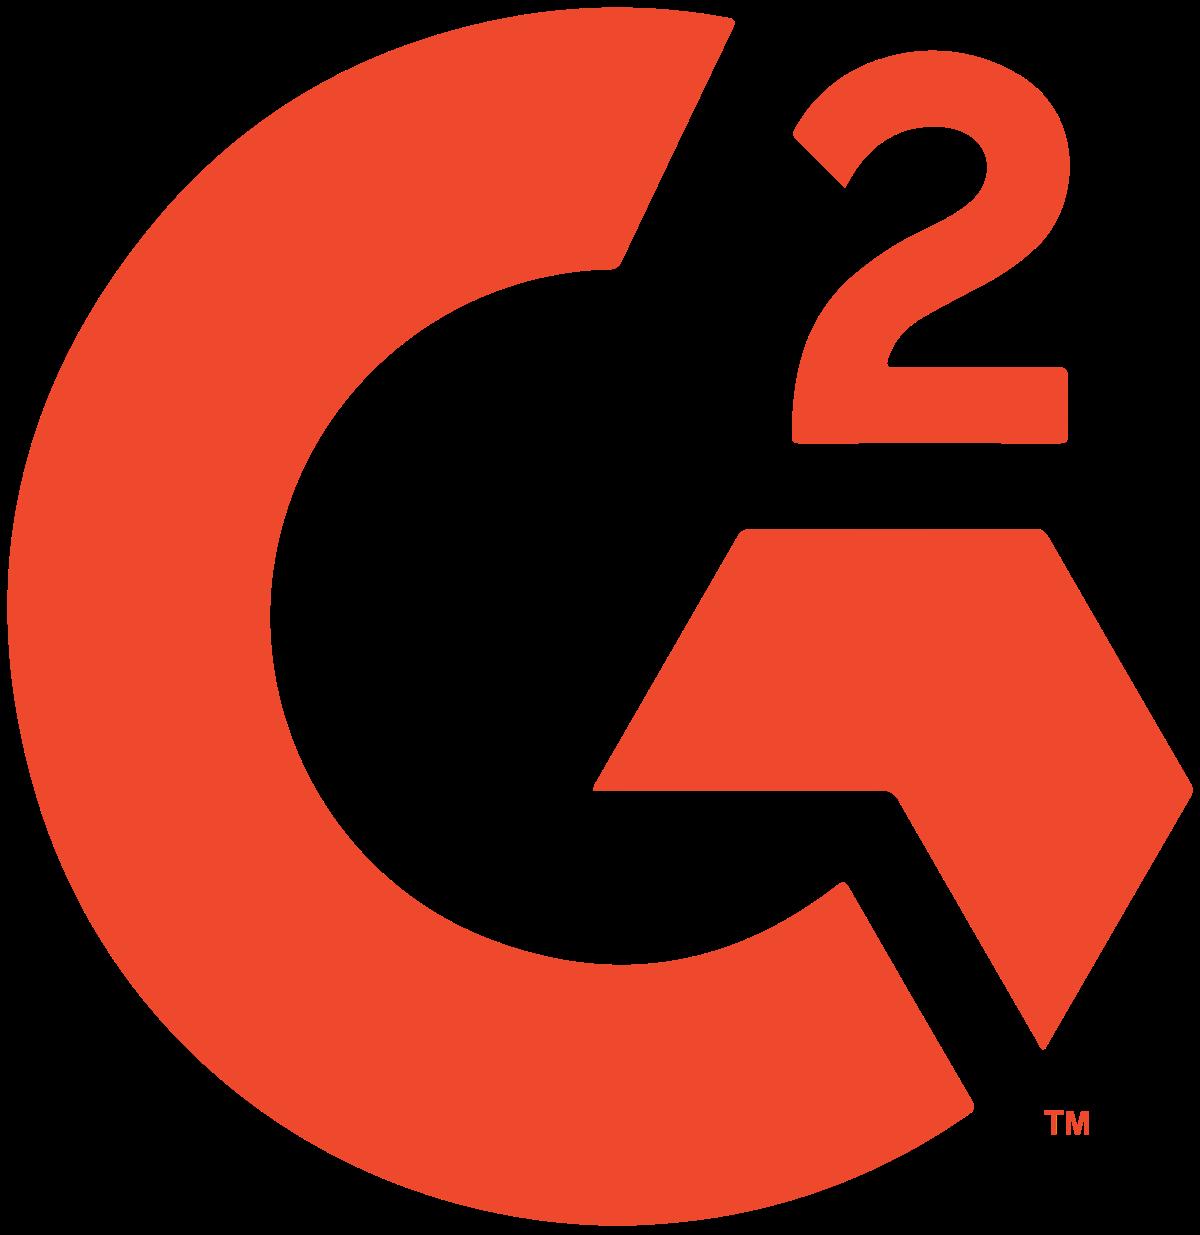 drata g2 logo